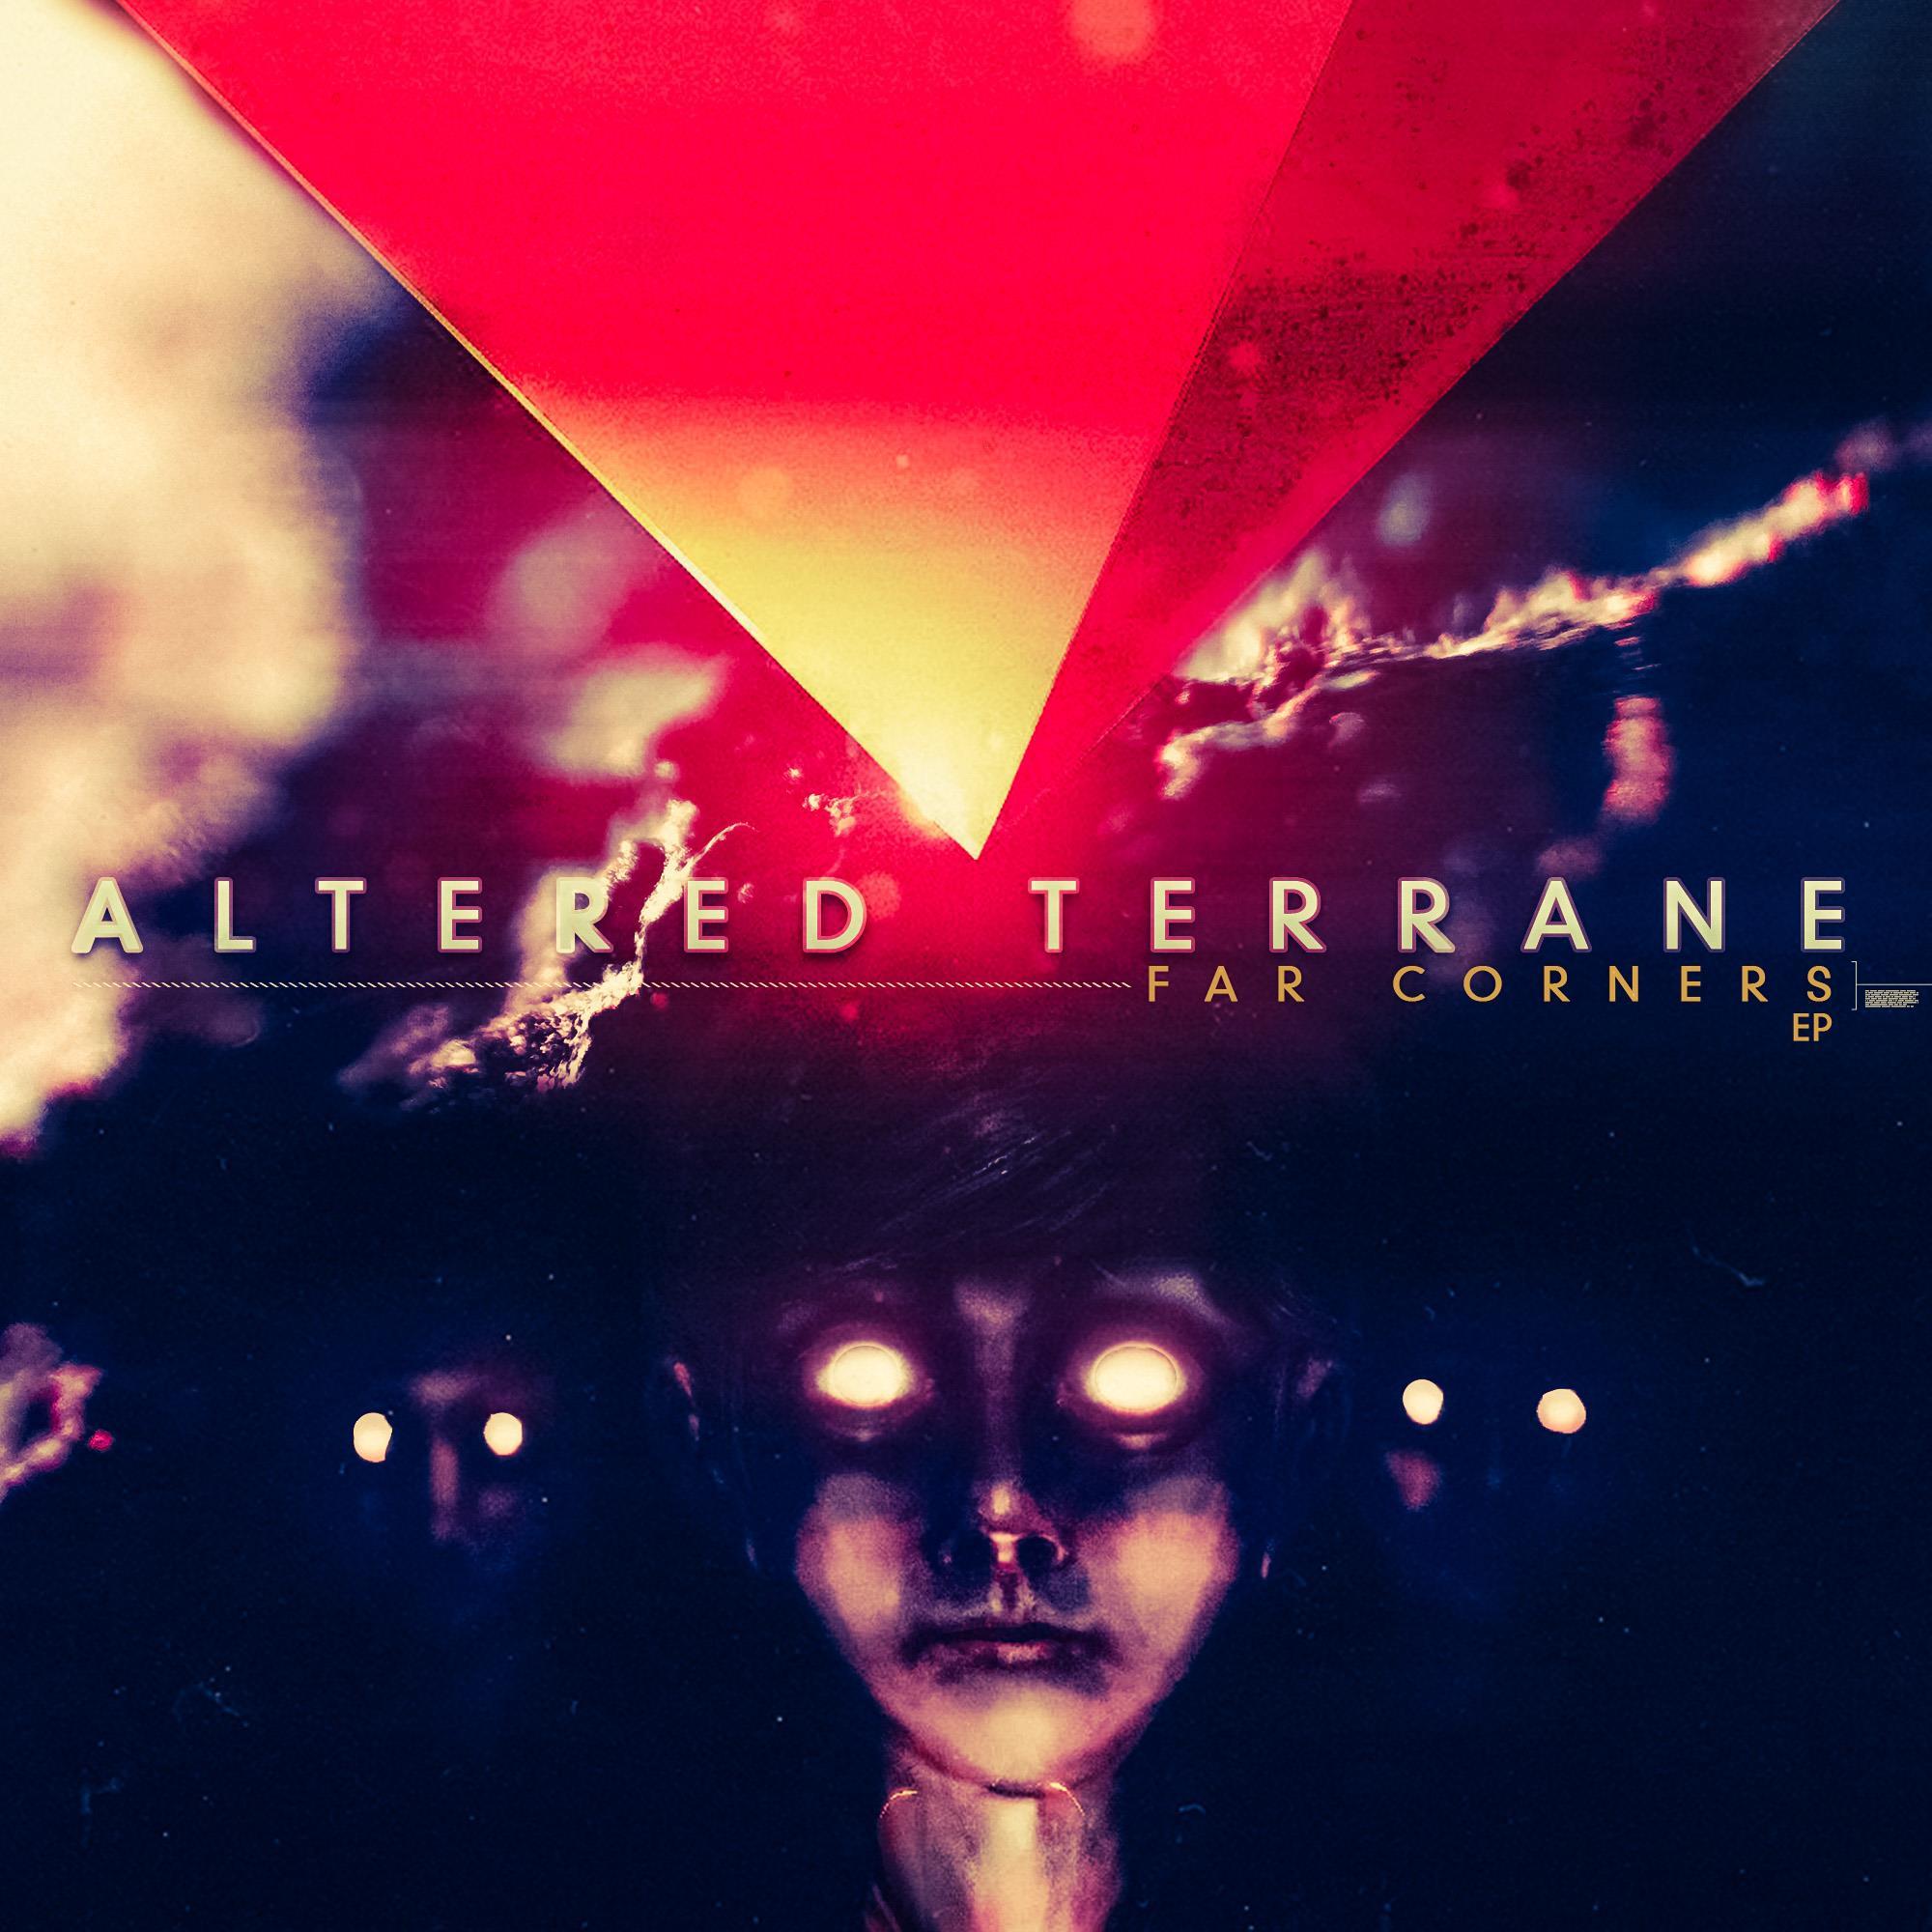 Drum & Bass With Interstellar Aesthetics: Altered Terrane – Far Corners EP